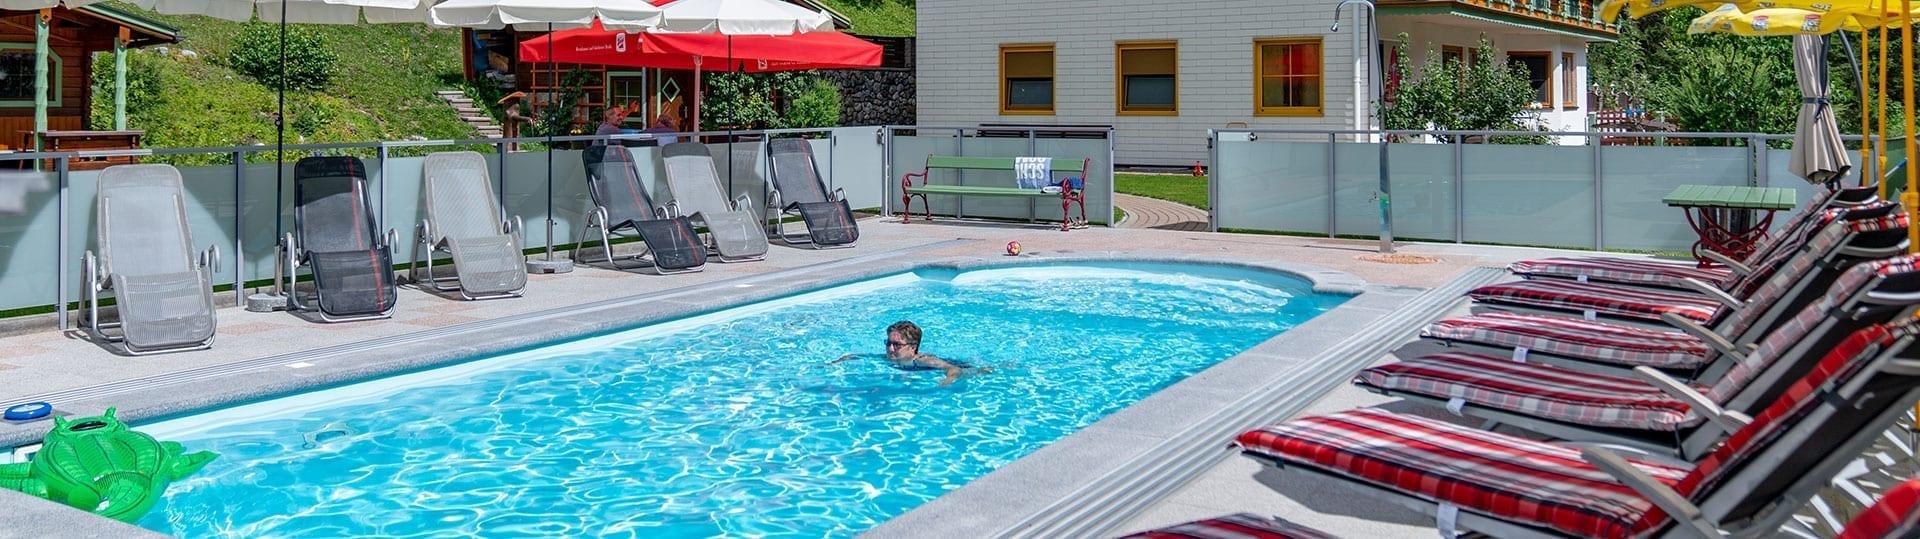 Garten & Pool, Gästehaus Herrmann in Filzmoos